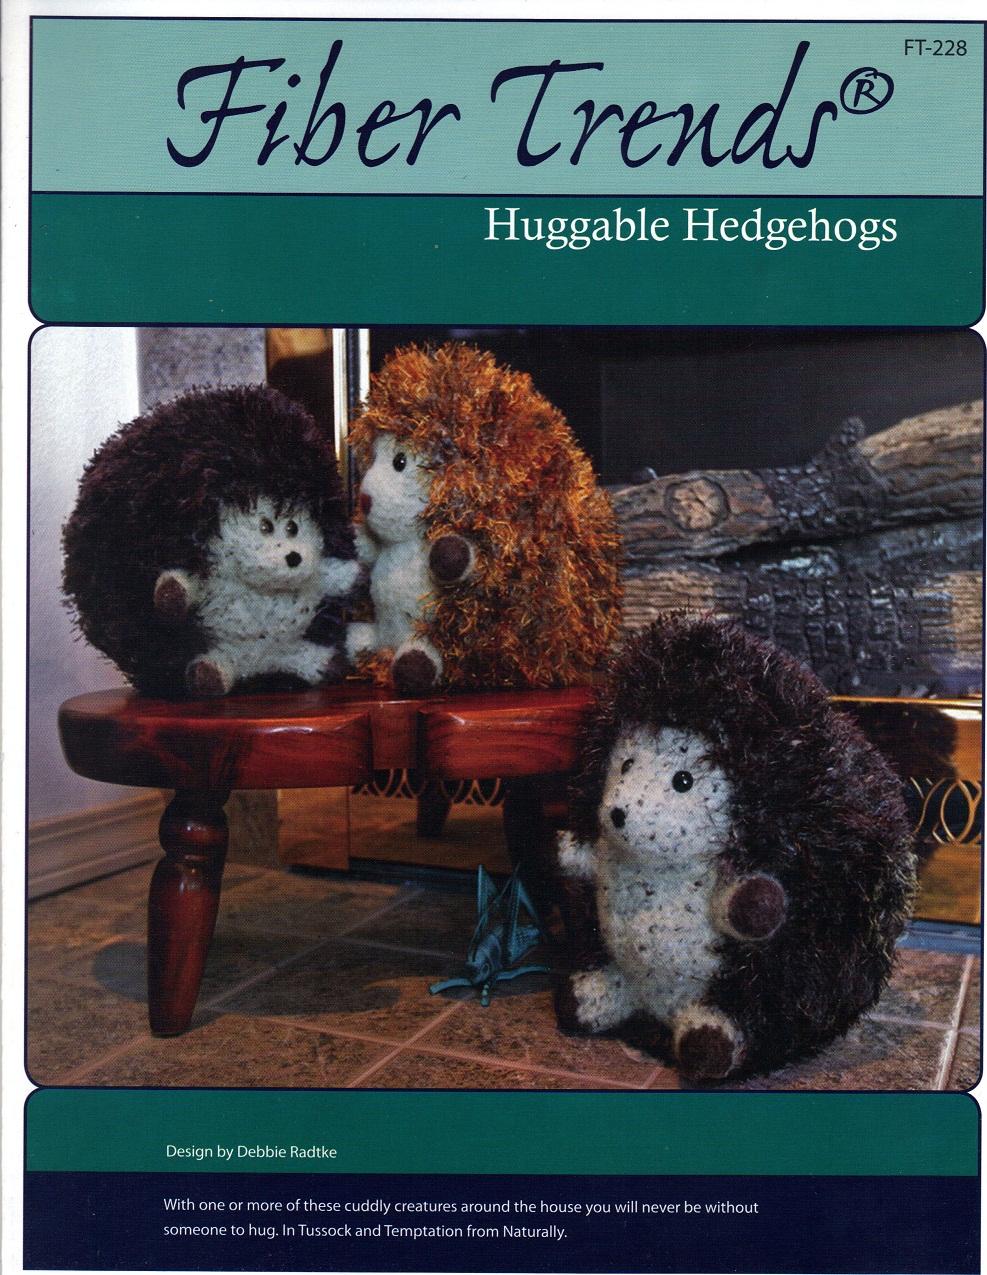 Huggable Hedgehog Knitting Pattern : Mels Daisy Patch Crochet and Crafts: Fiber Trends Pattern ...